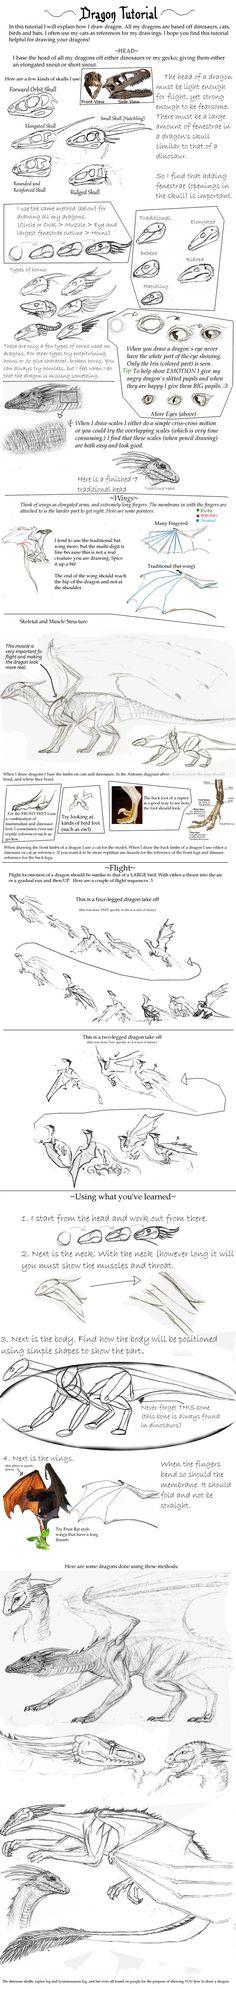 Dragon-Tutorial 1501